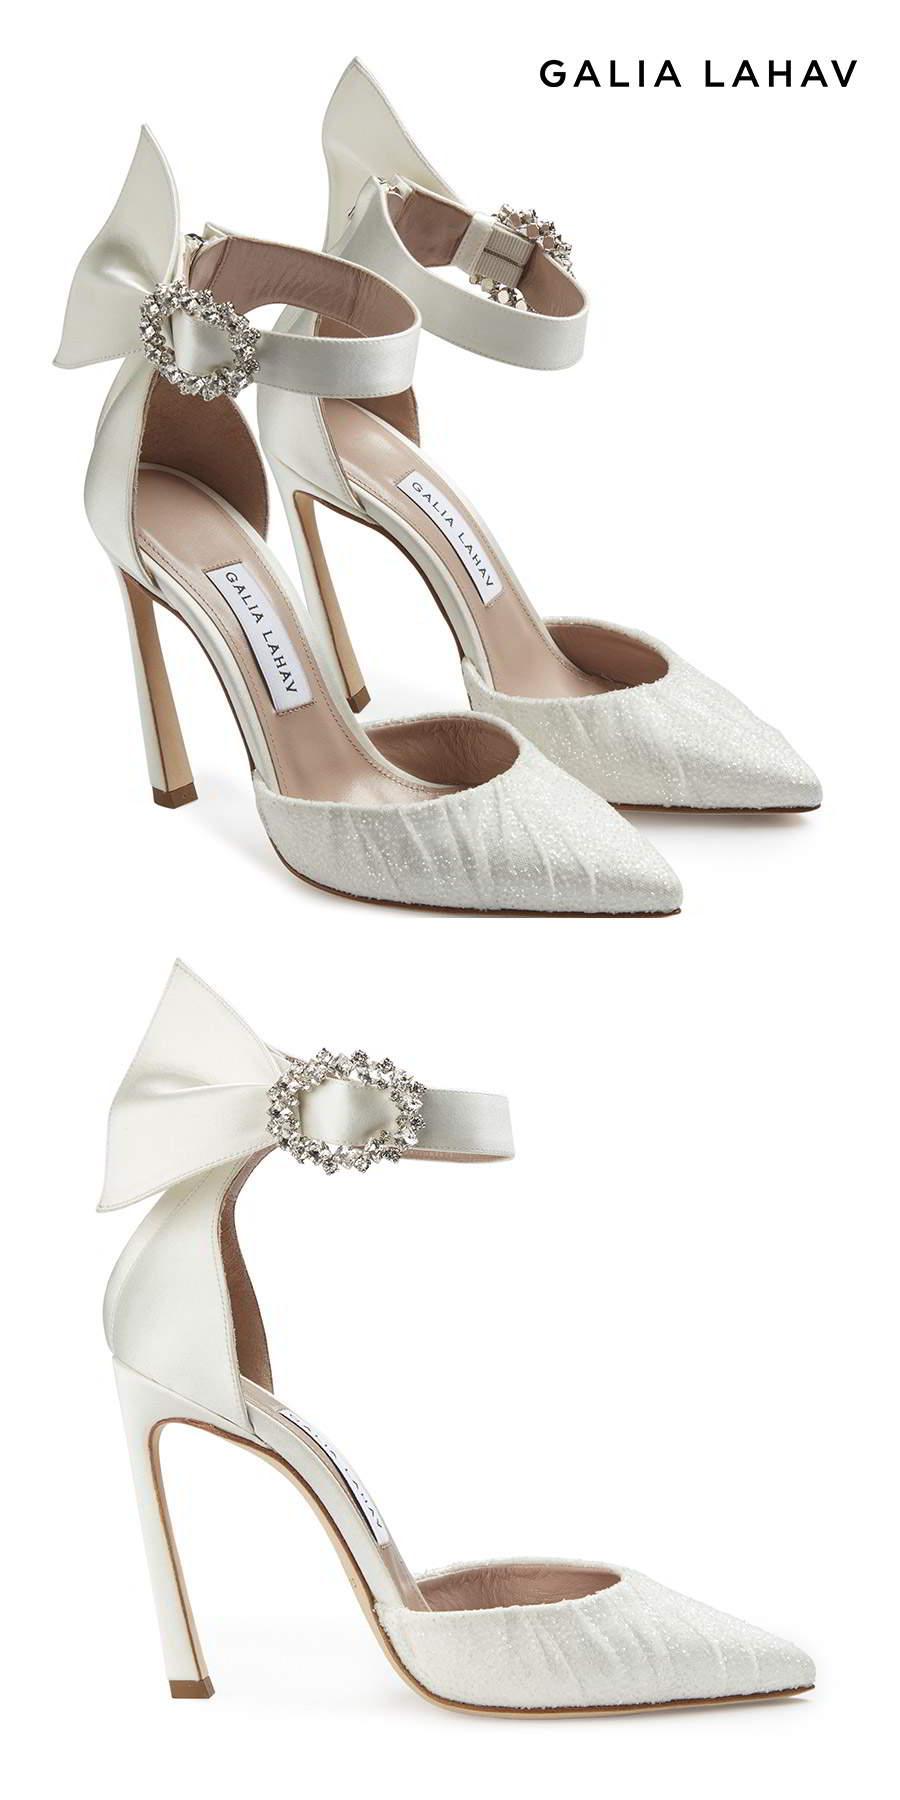 galia lahav shoes fall 2021 bridal beaded high heel pointed toe d orsay pump ankle straps wedding shoes packshot (ariel) mv